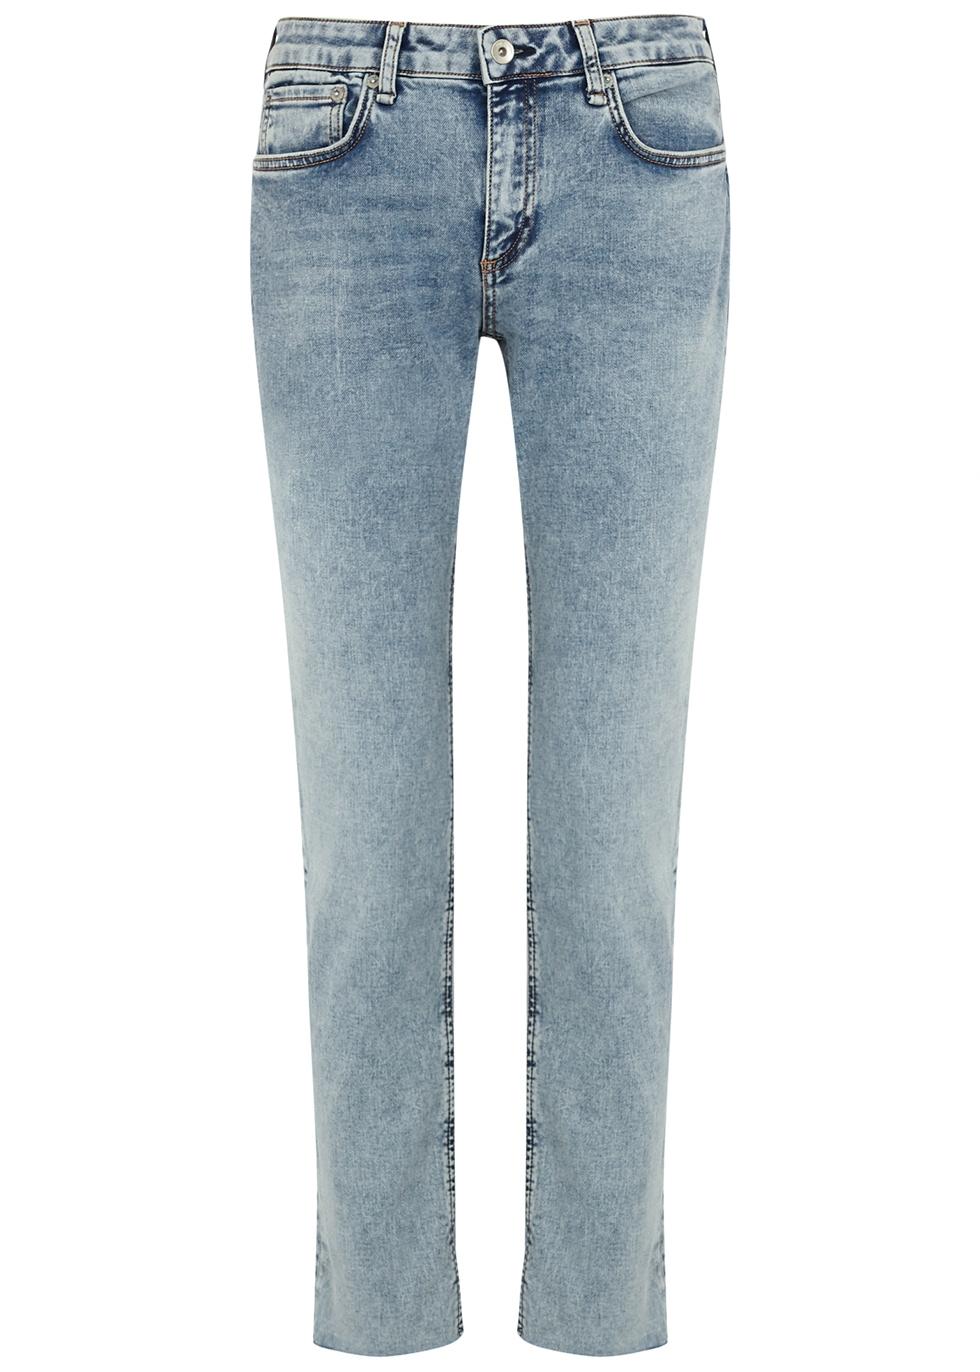 Dre Loopback blue slim boyfriend jeans